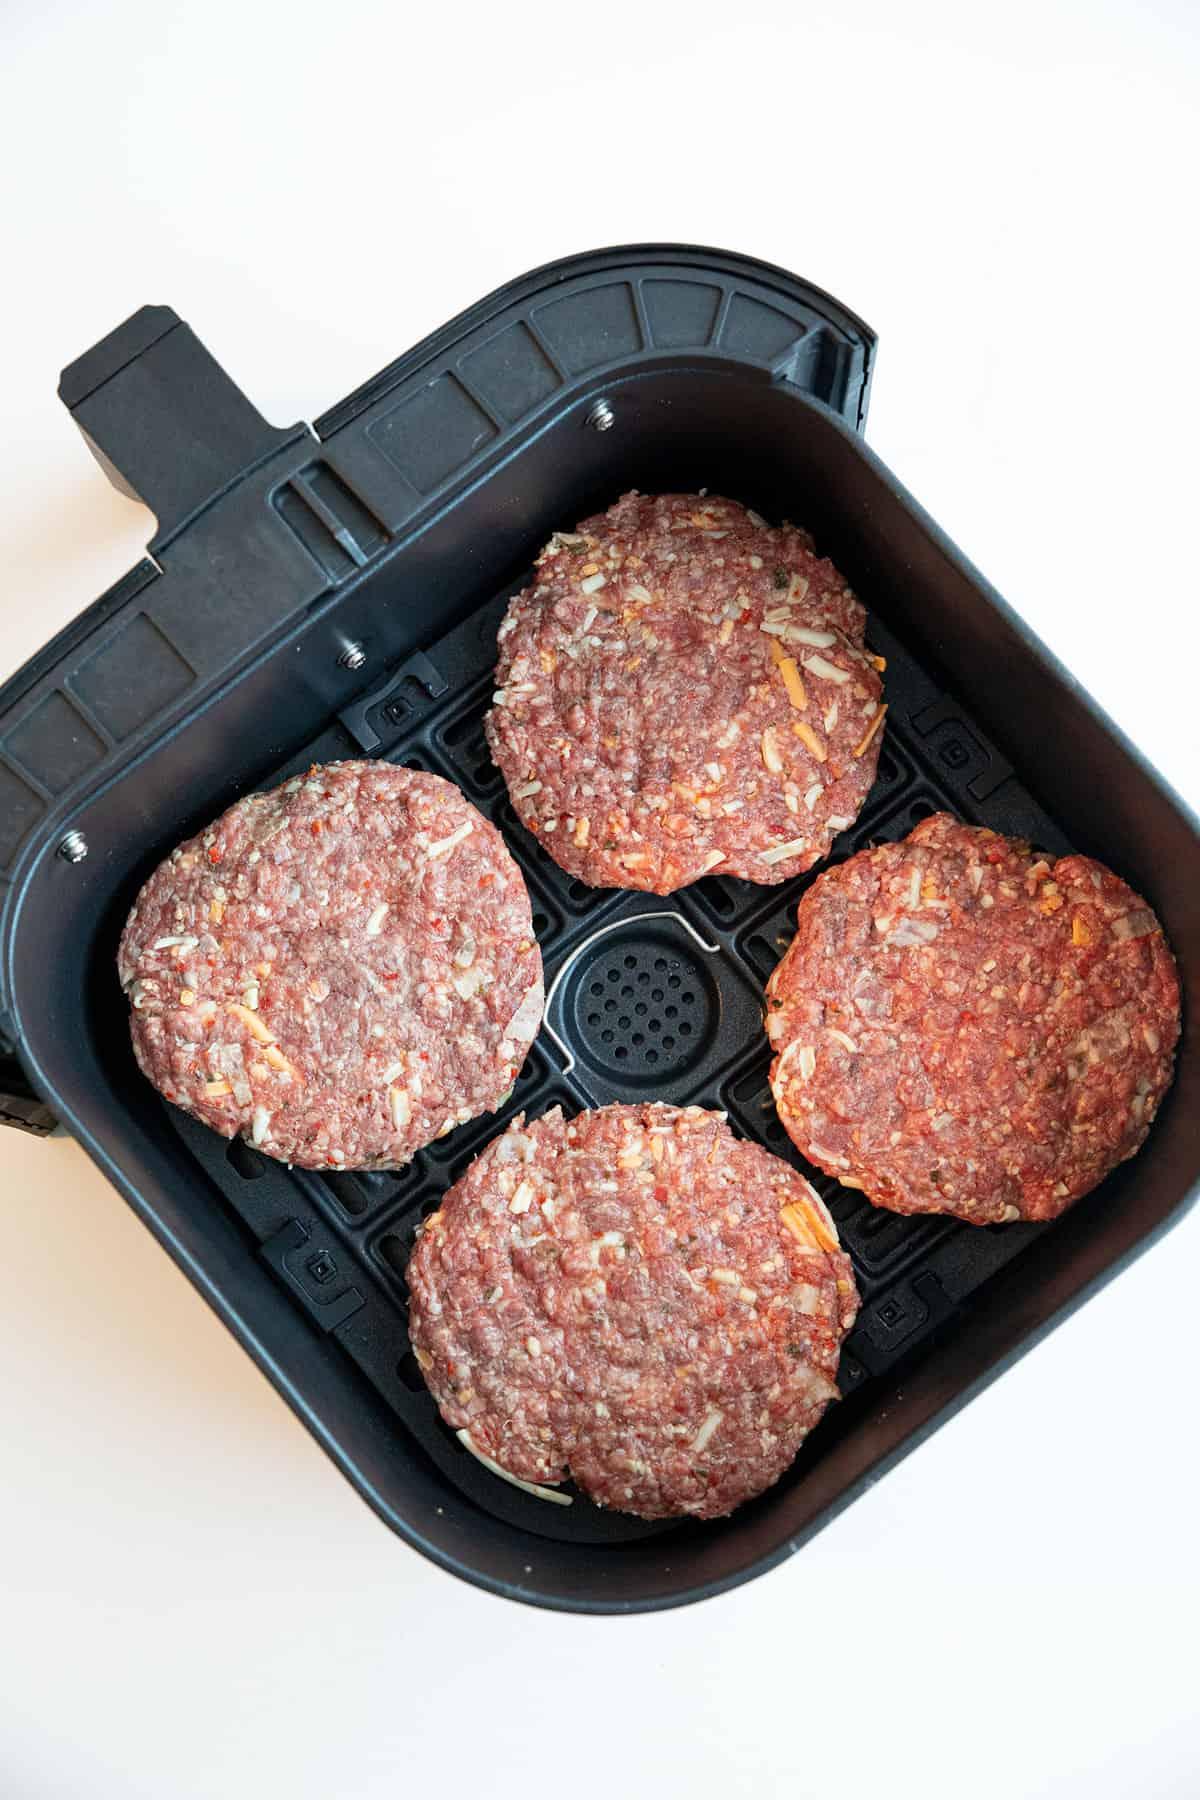 Burger patties in an air fryer basket